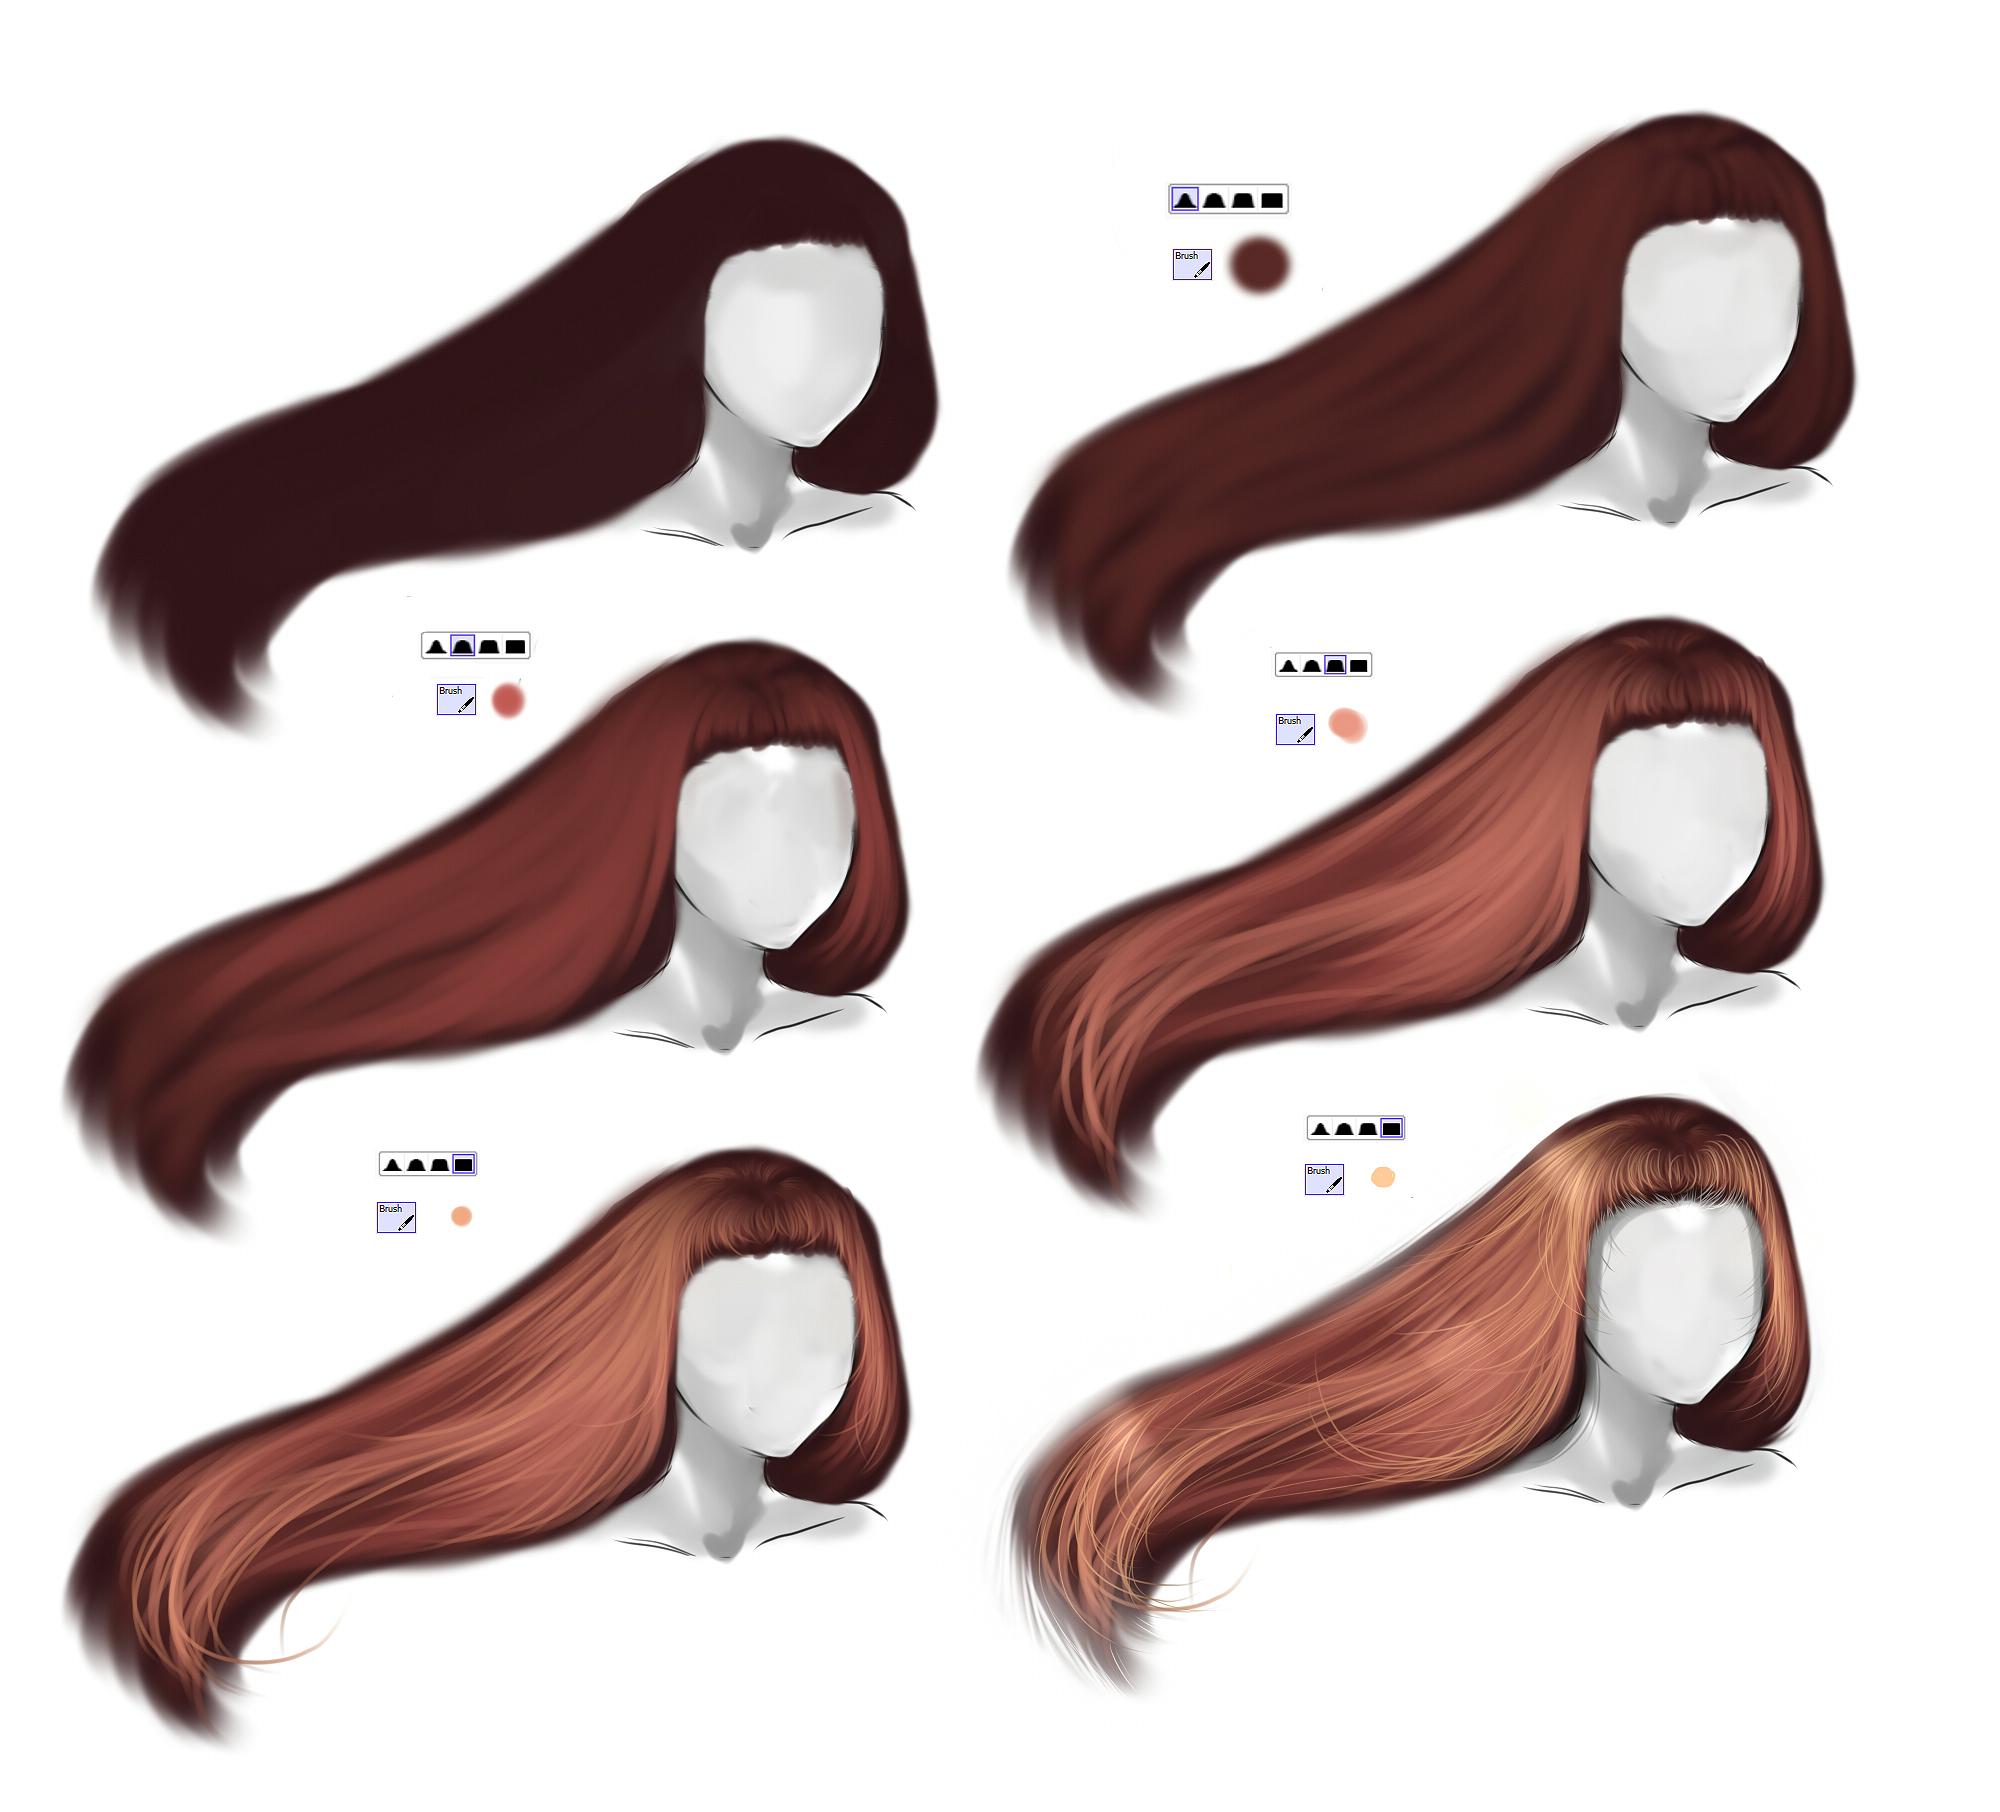 Hair tutorial by ryky on deviantart hair tutorial by ryky hair tutorial by ryky ccuart Images